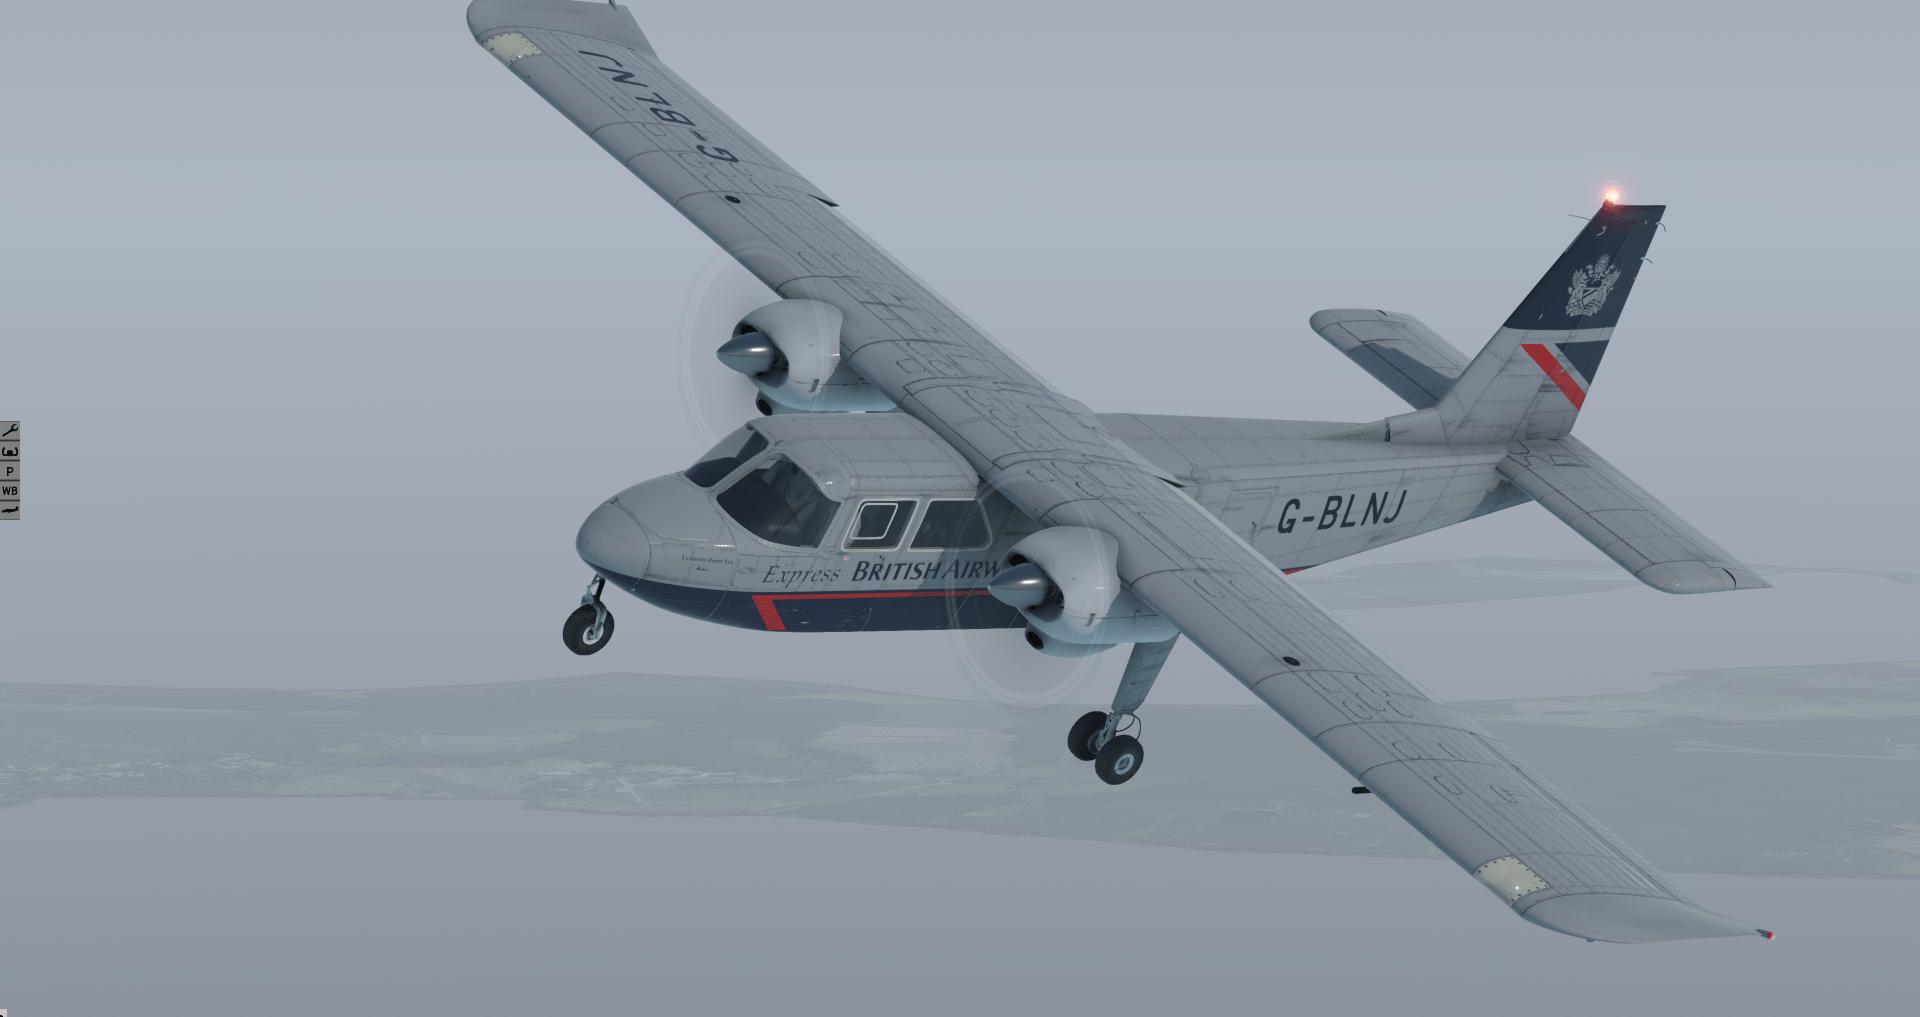 Islander-2020-06-15-4.21.05-a.m. Nimbus Releases BN-2 Islander for X-Plane